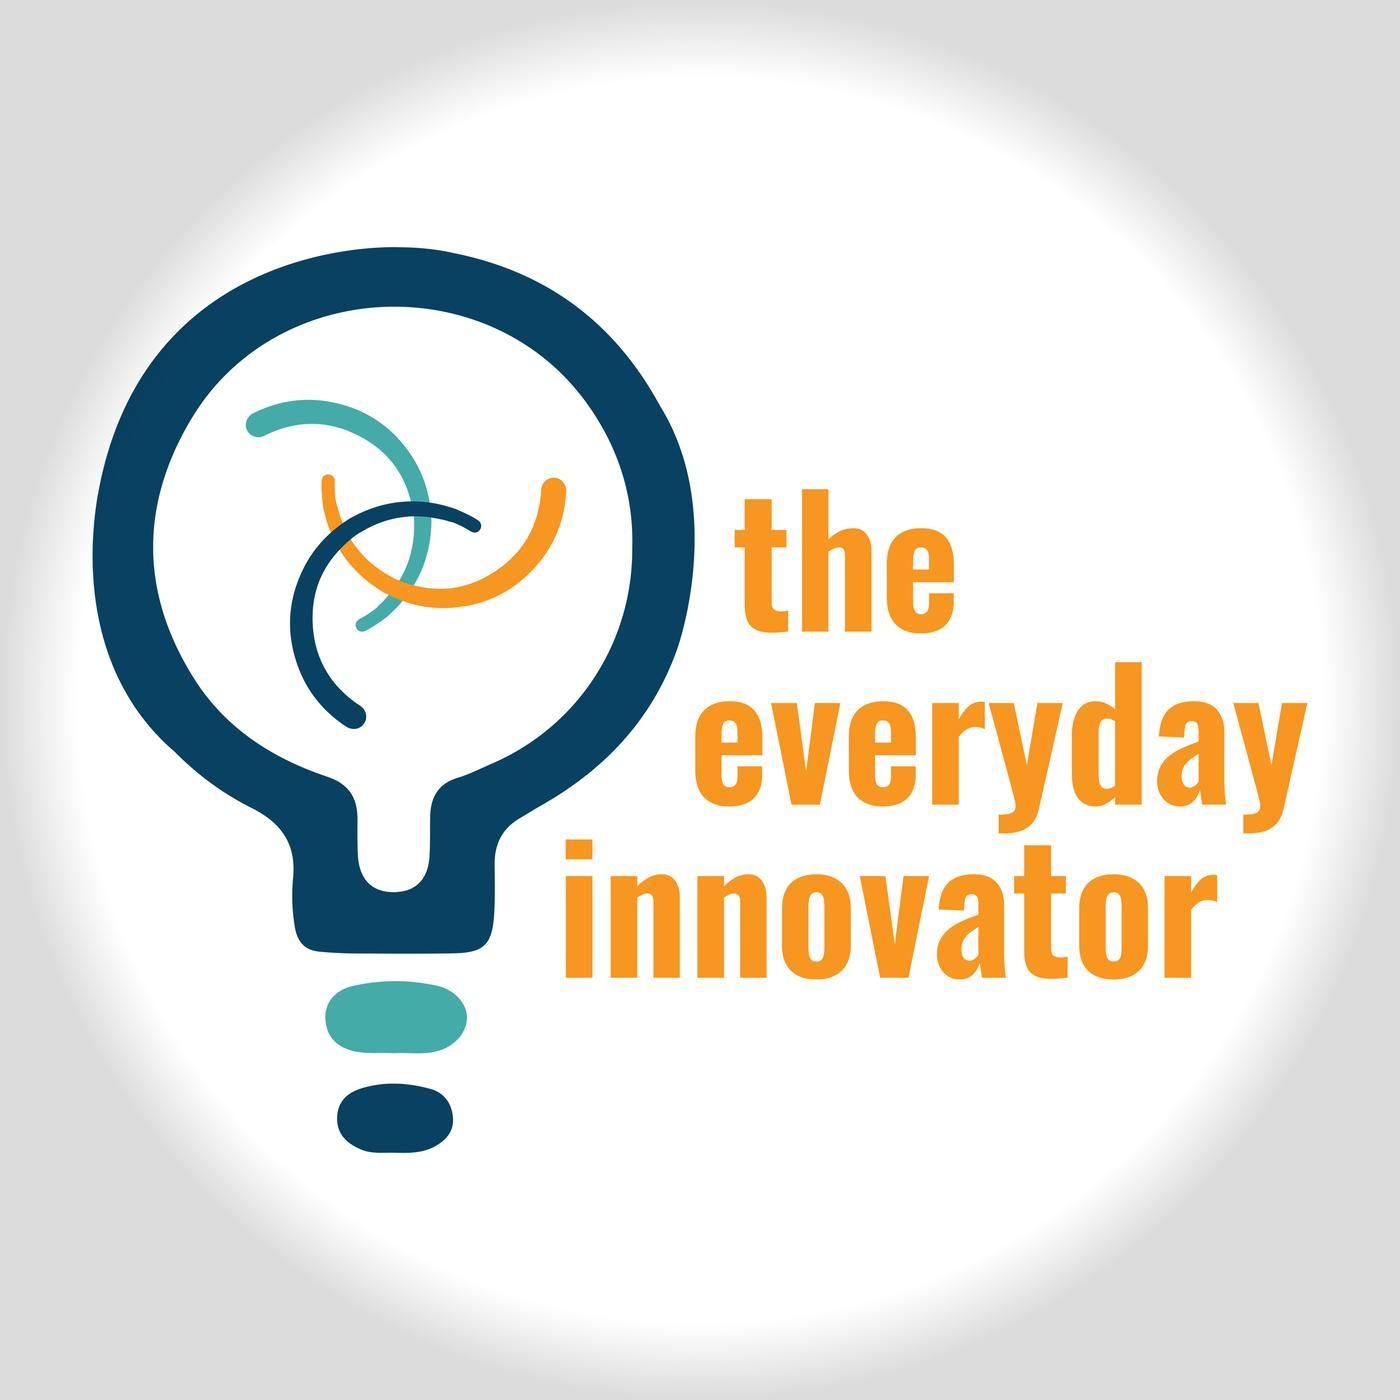 The Everyday Innovator